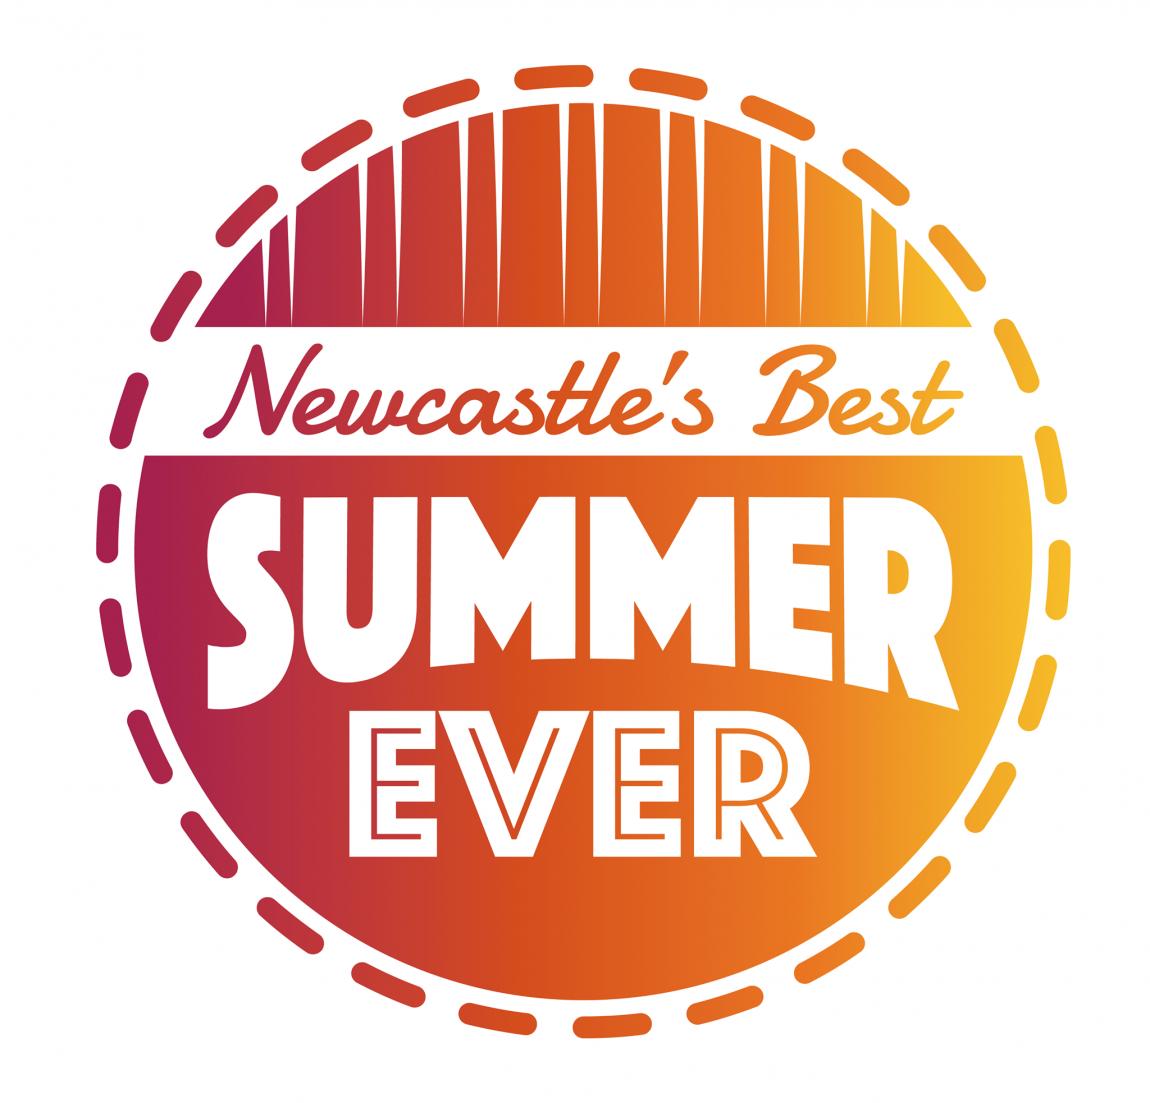 newcastle's best summer ever 2021